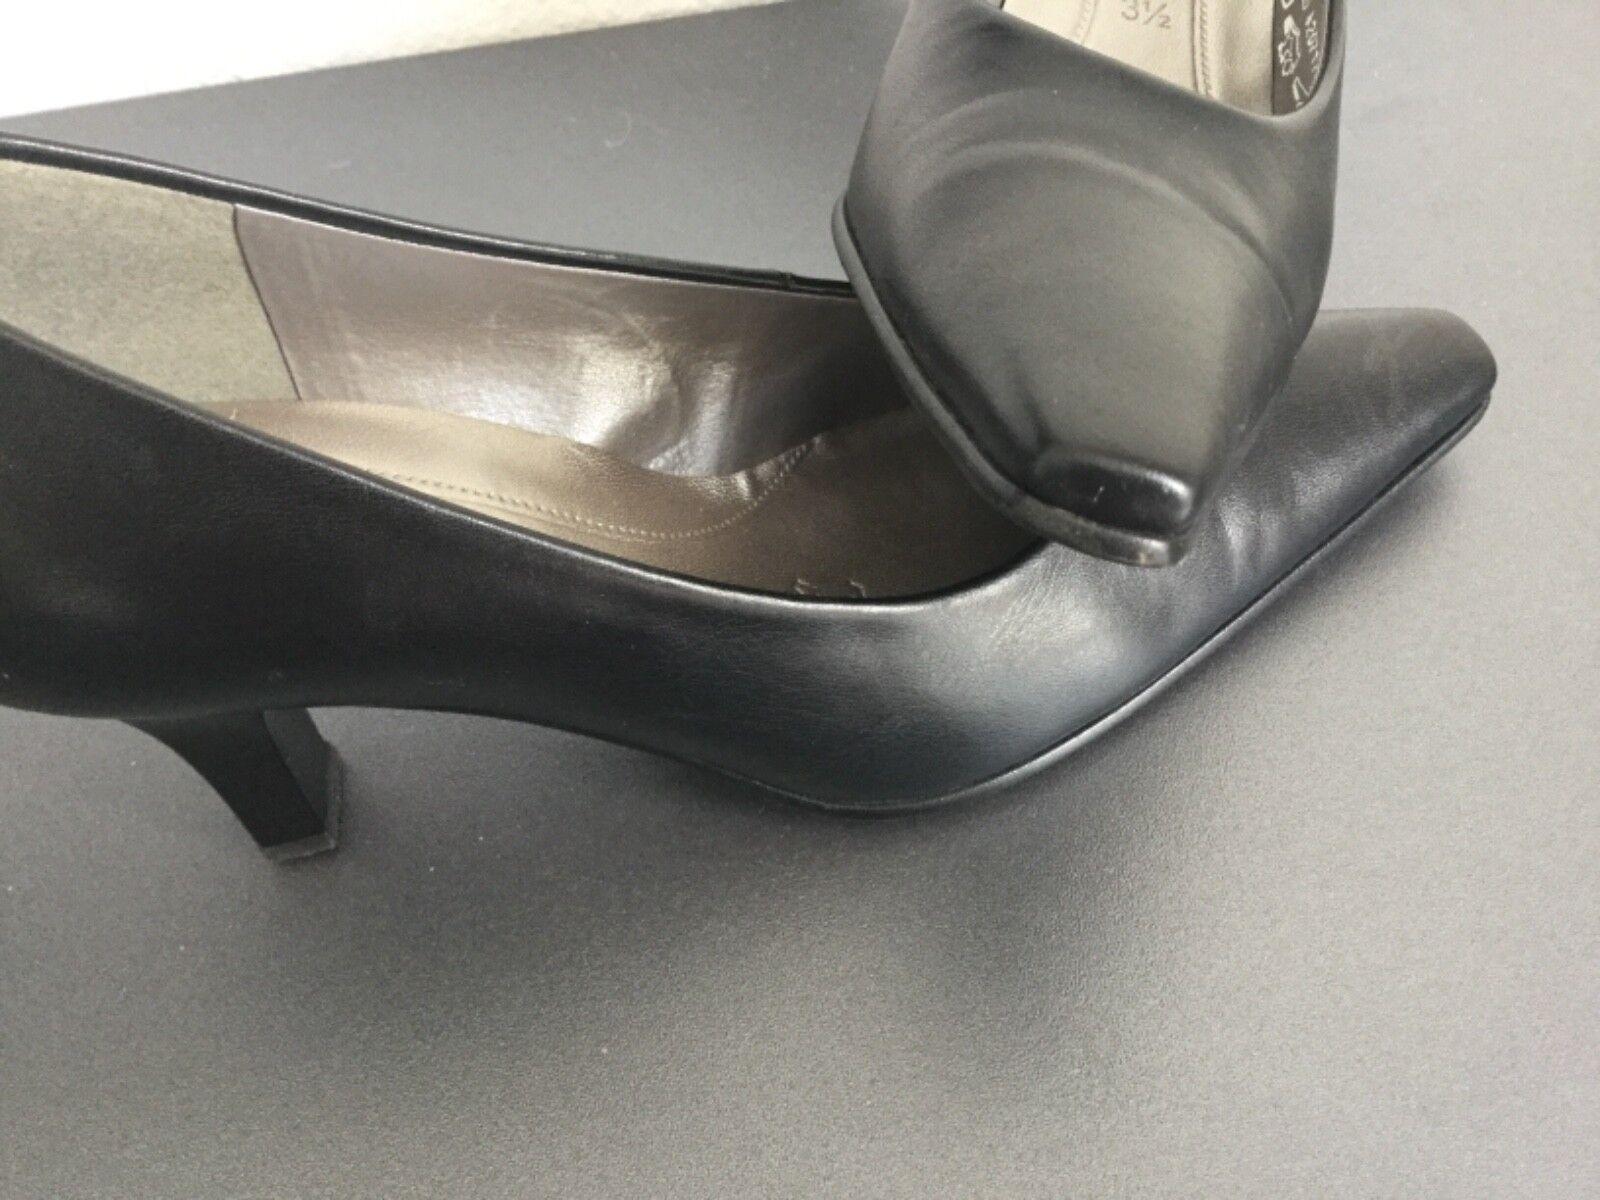 Gabor eleganter Leder, Pumps schwarz, 37, 3,5, Leder, eleganter 6 cm Absatz, chic, neuwertig 72e81c